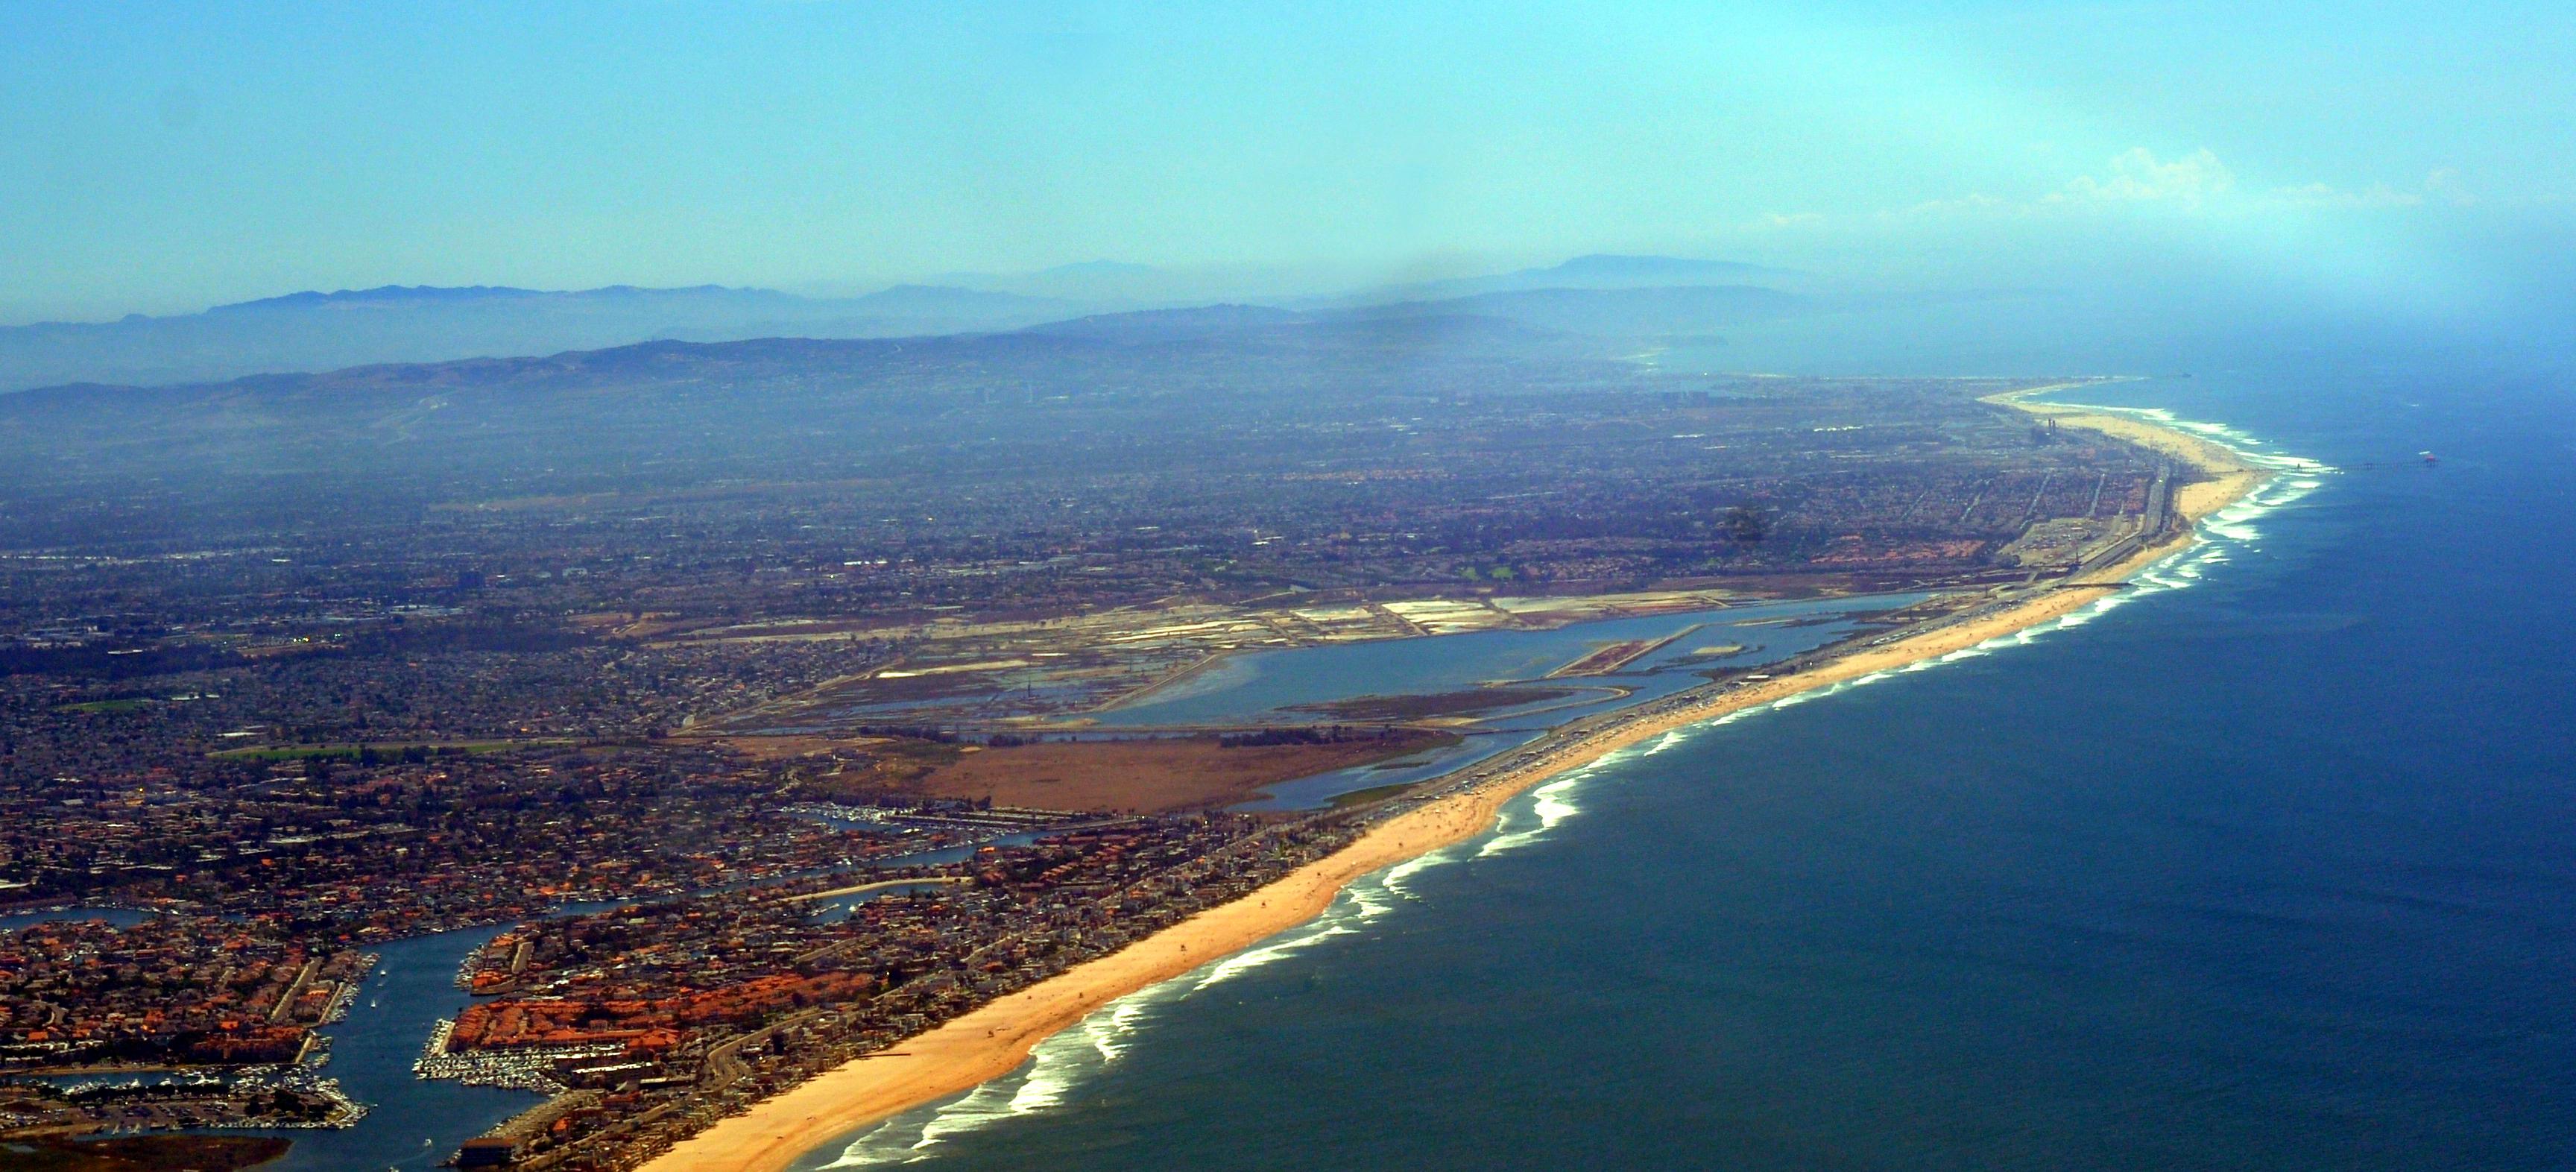 Bolsa Chica Wetlands Brightwater Trailhead Huntington Beach Ca